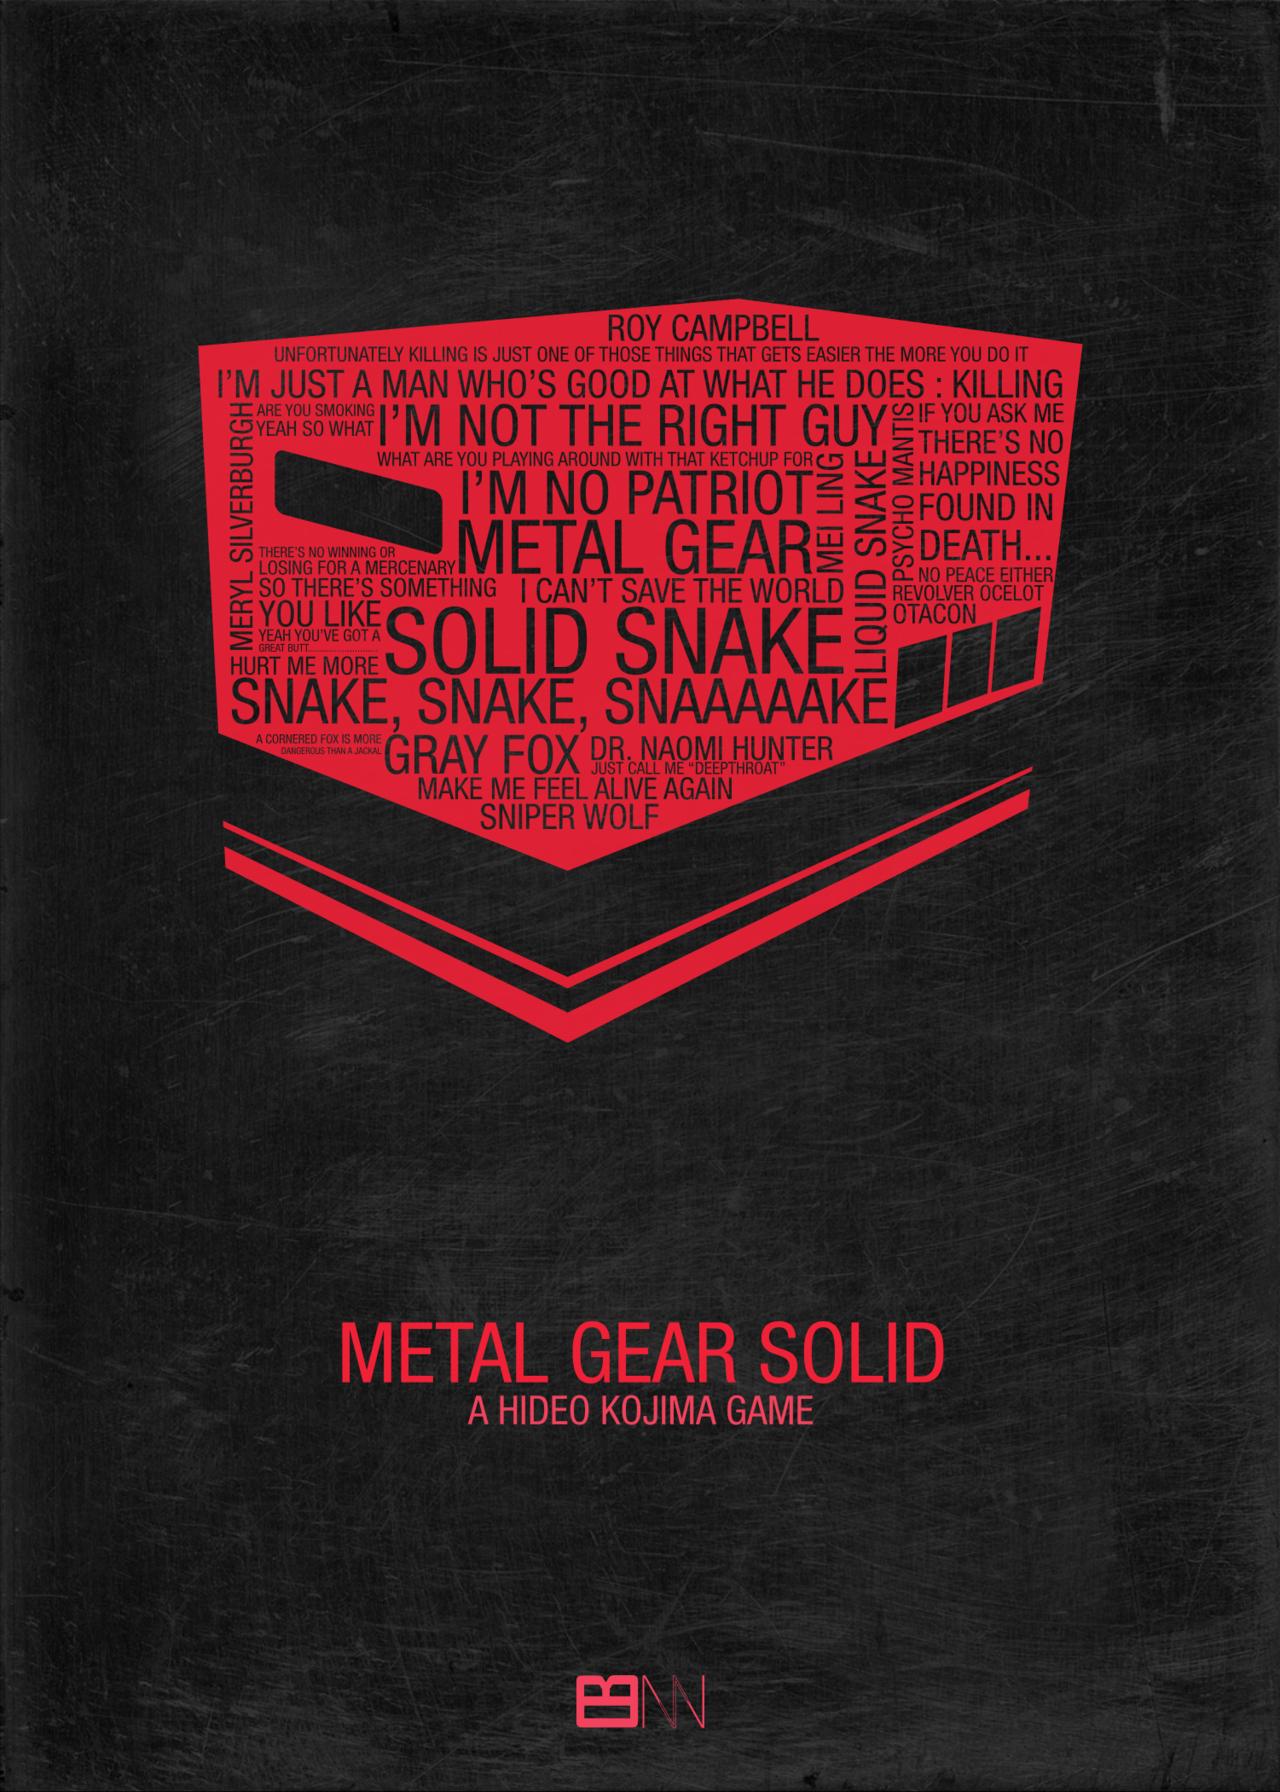 Metal Gear Solid Metal Gear Metal Gear Solid Metal Gear Series